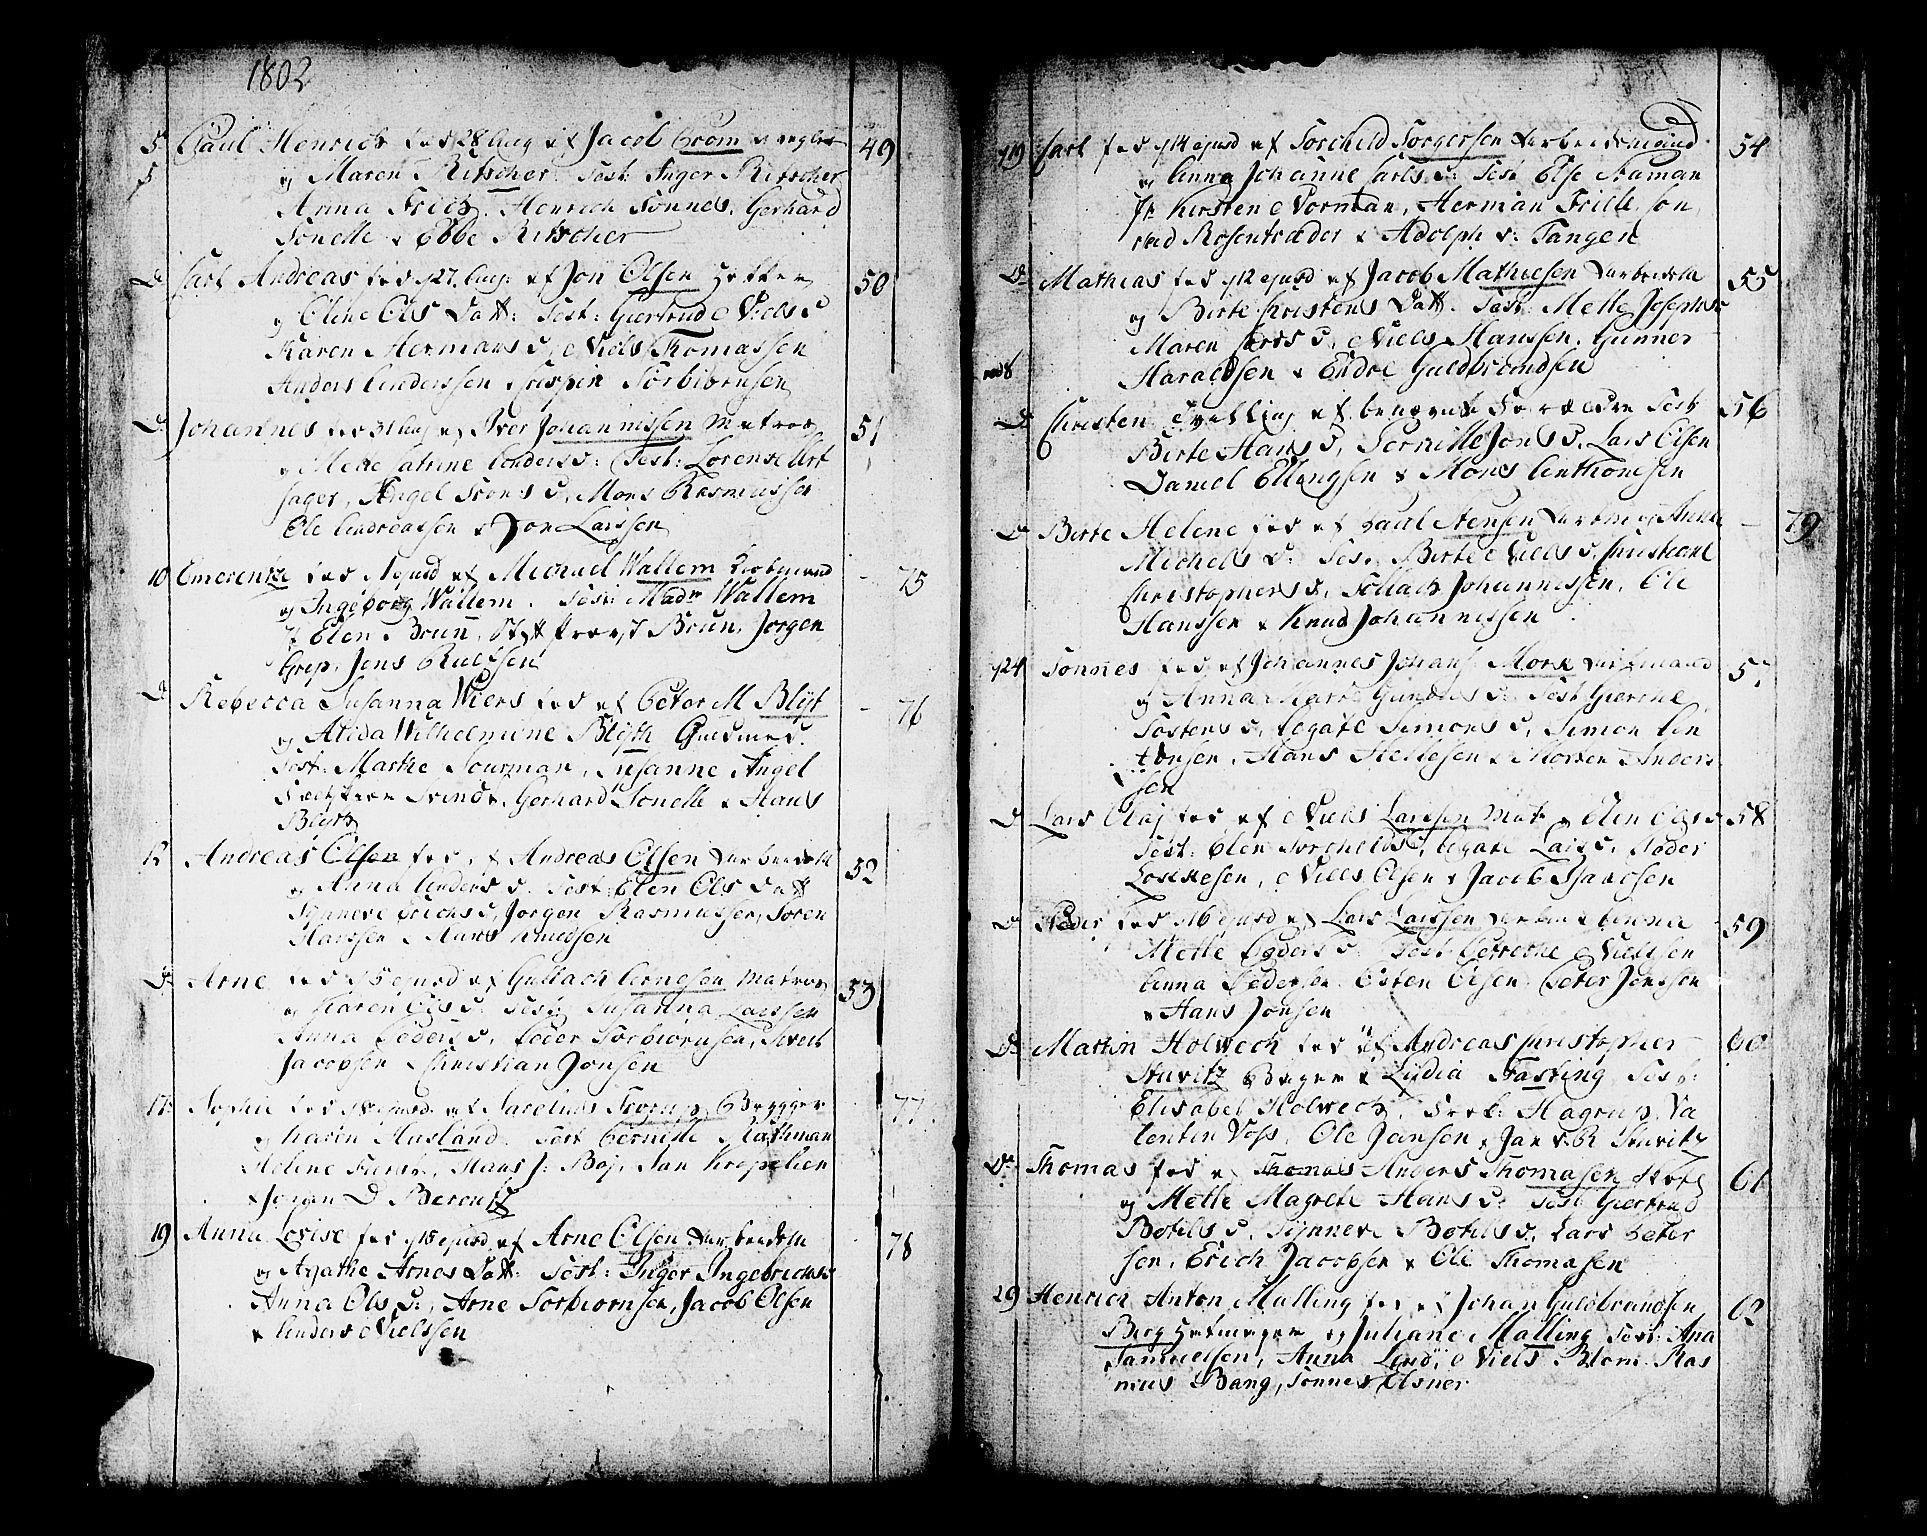 SAB, Domkirken sokneprestembete, H/Haa/L0004: Ministerialbok nr. A 4, 1763-1820, s. 282-283